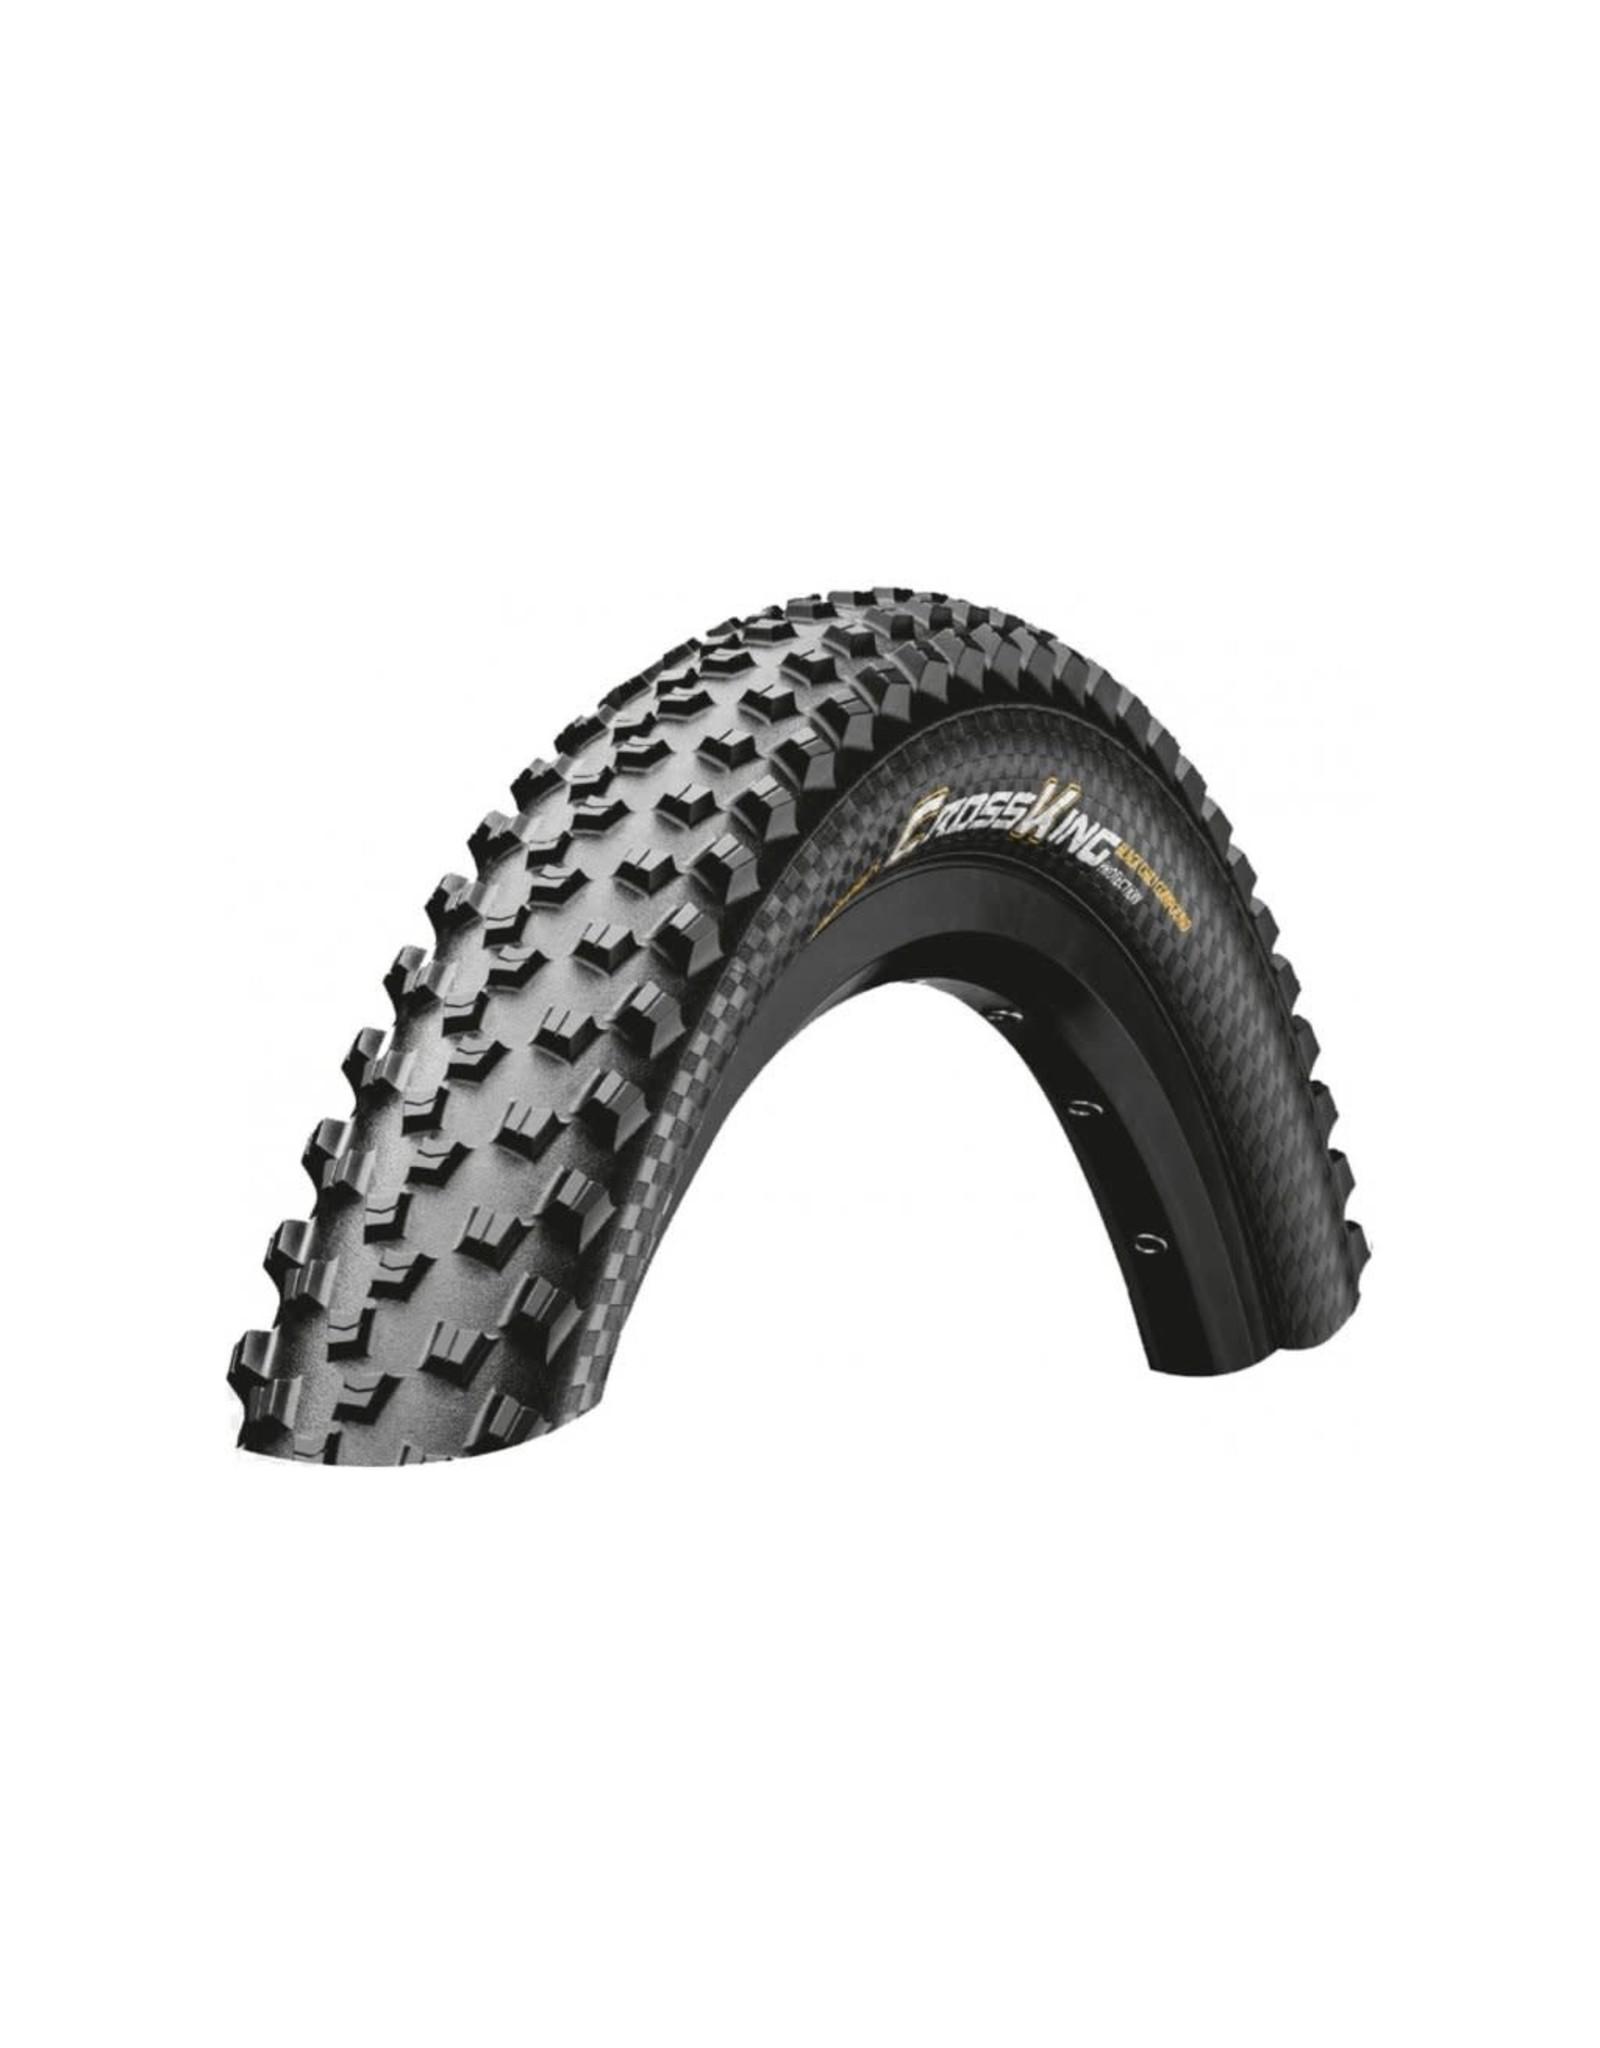 Continental Continental - XC/Enduro Tires Cross King 27.5 x 2.6 ShieldWall Folding TR + Puregrip